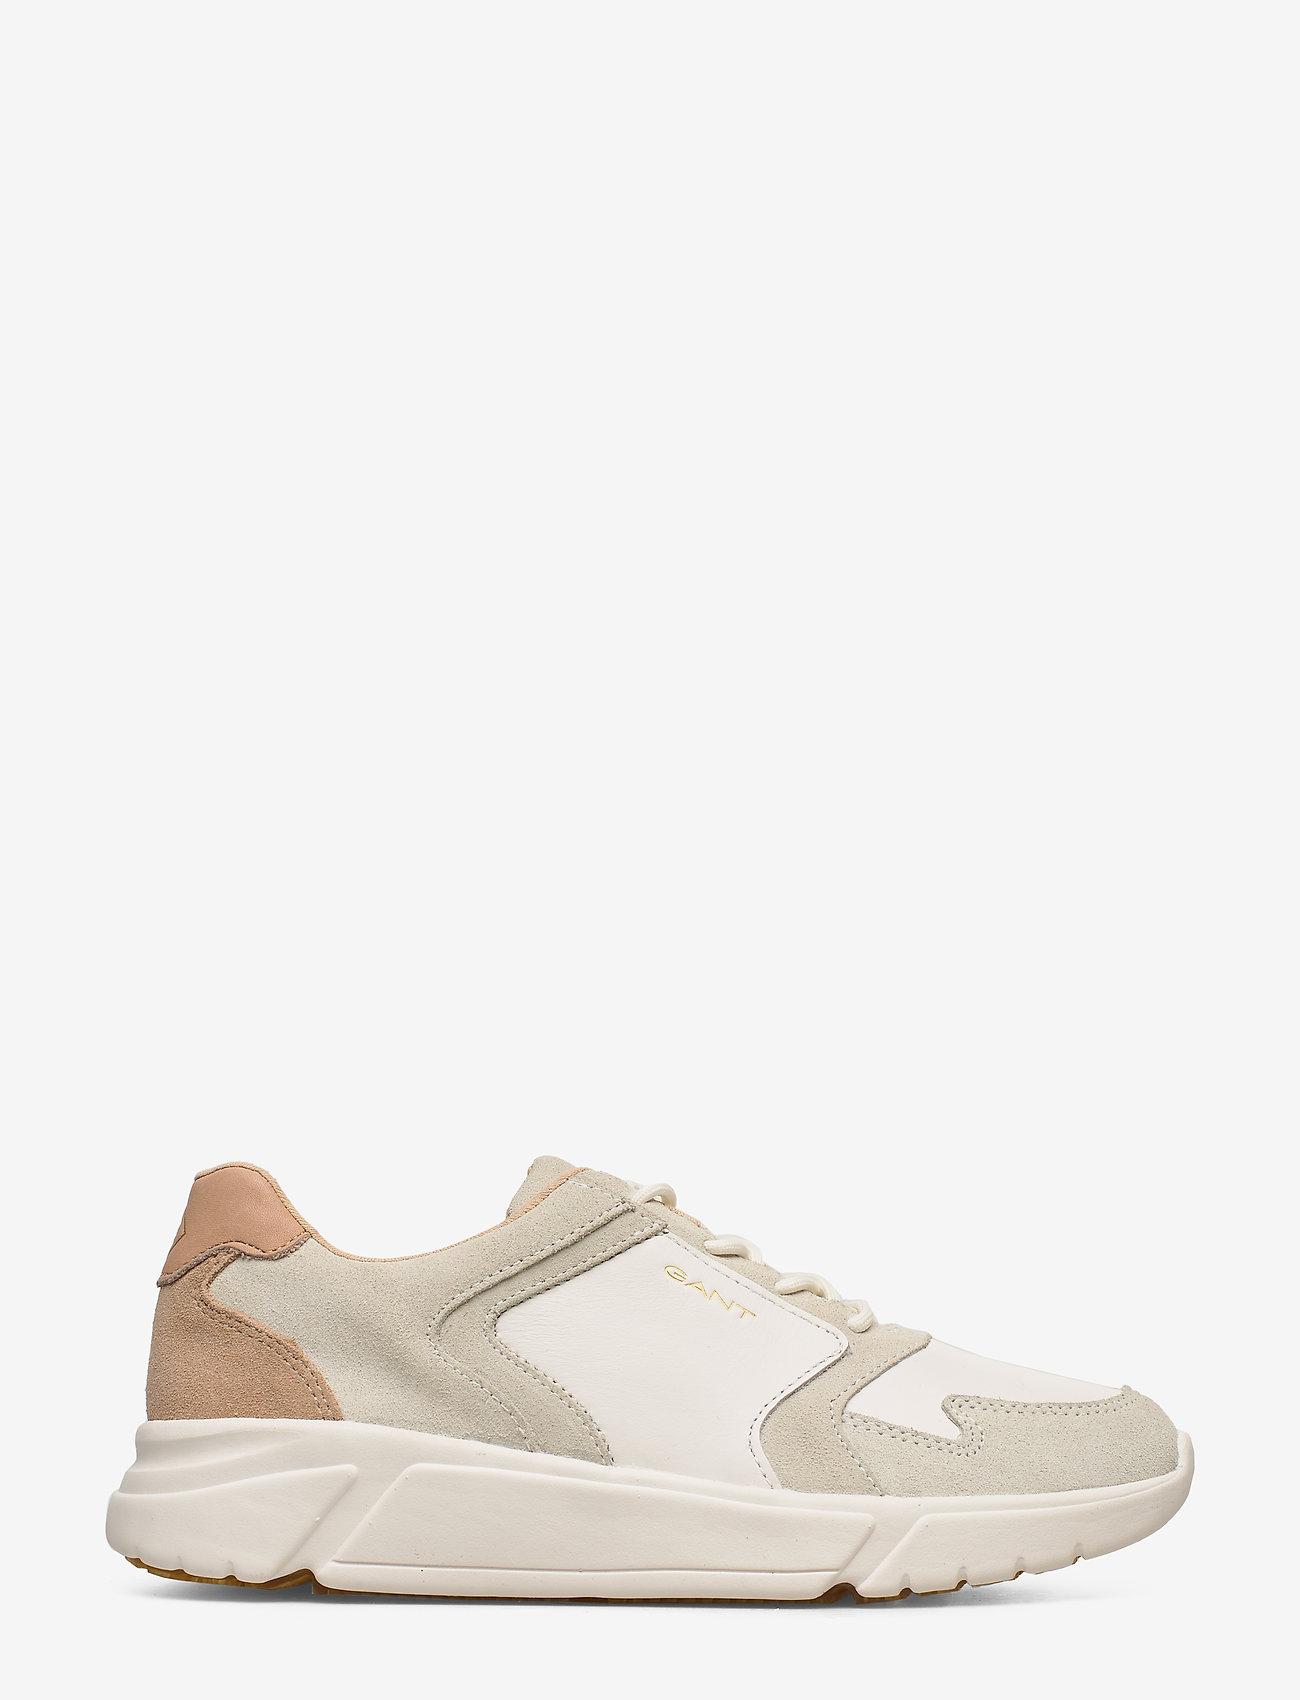 Cocoville Sneaker (Br.wht./cream/beige) (714.35 kr) - GANT